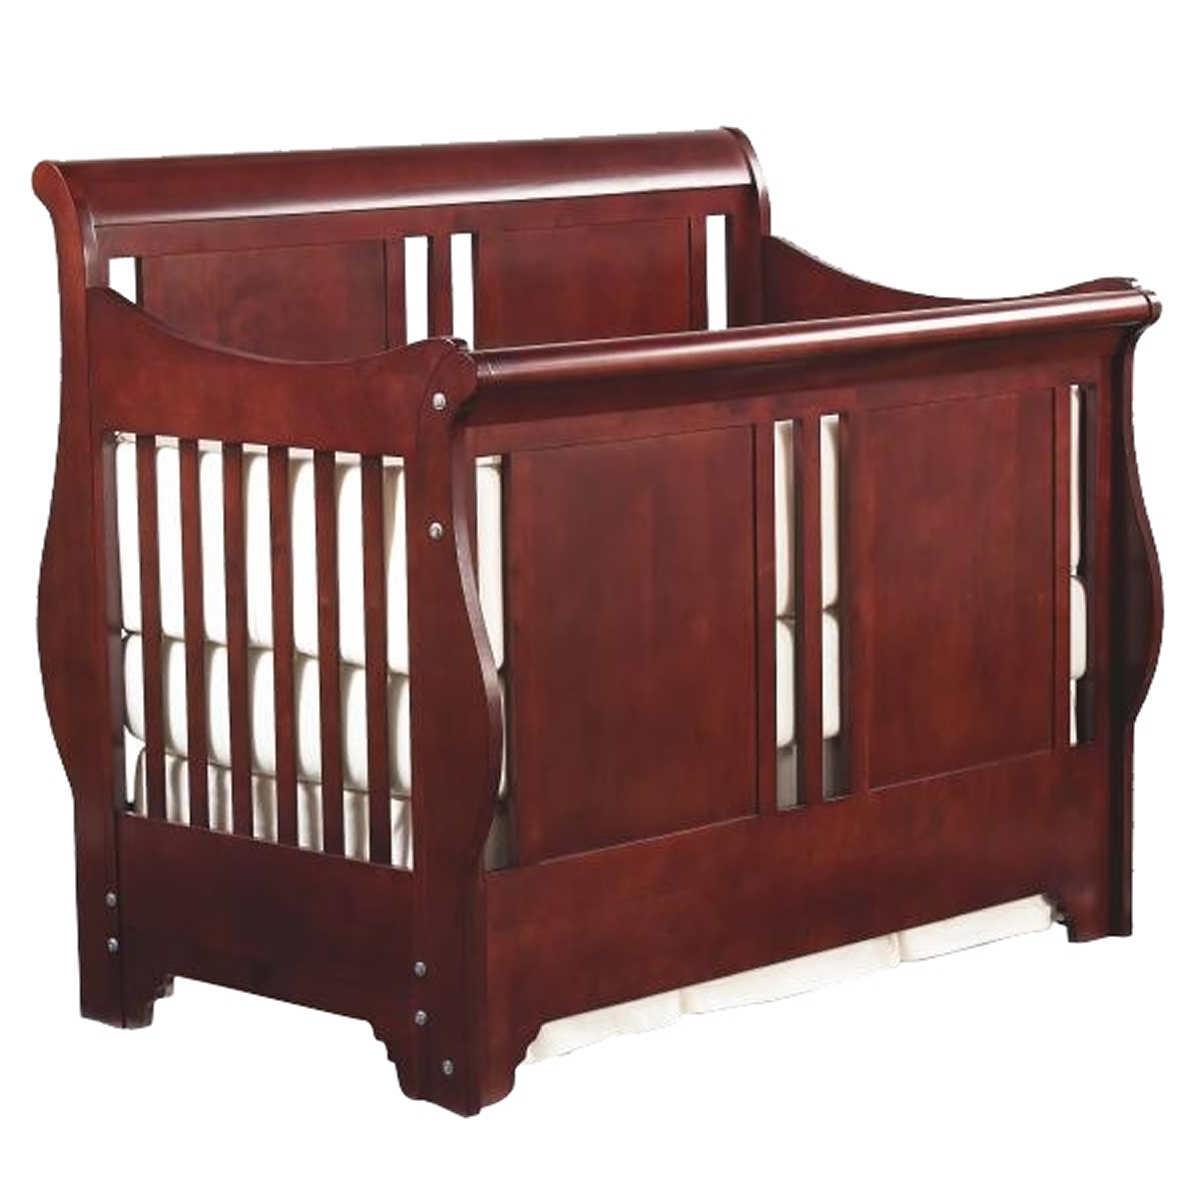 Baby crib for sale ottawa - Bradford 3 In 1 Crib Cherry Finish